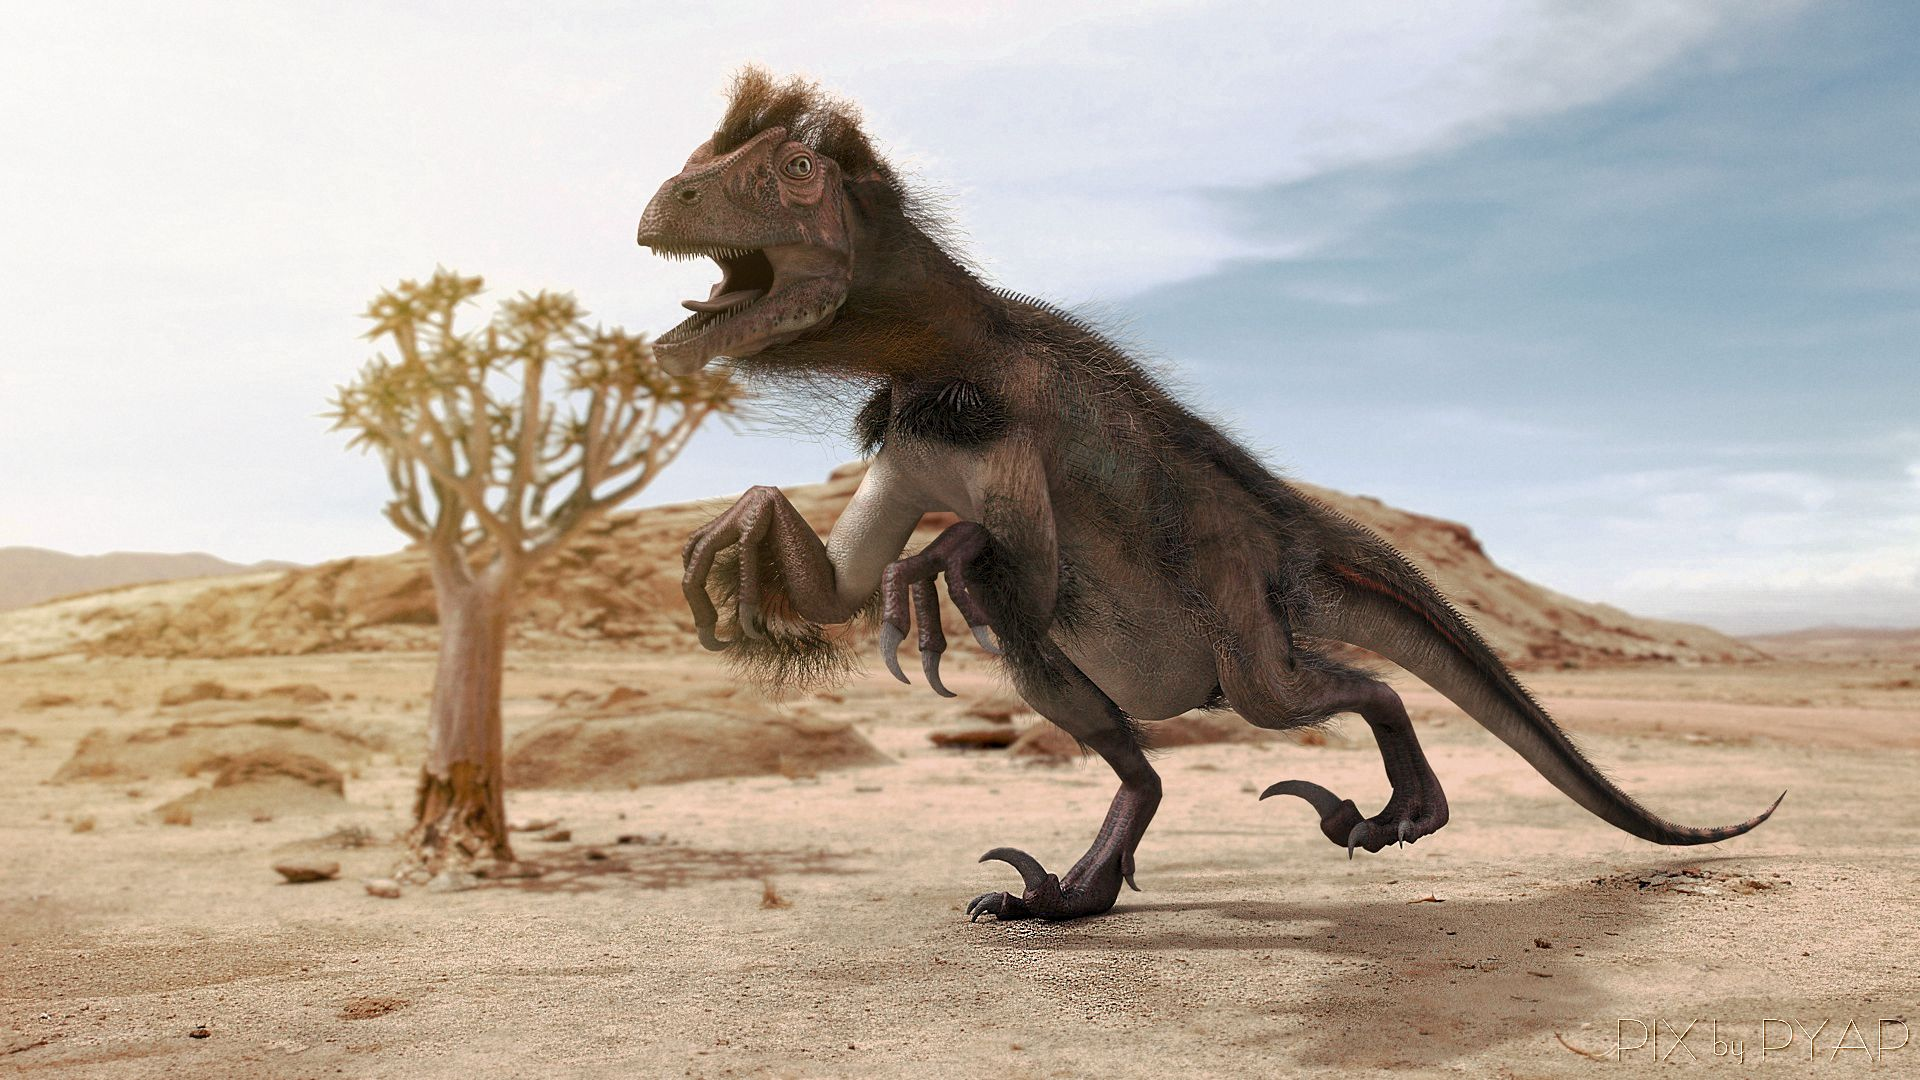 Utahraptor ostrommaysorum - CINEMA4D Pix -